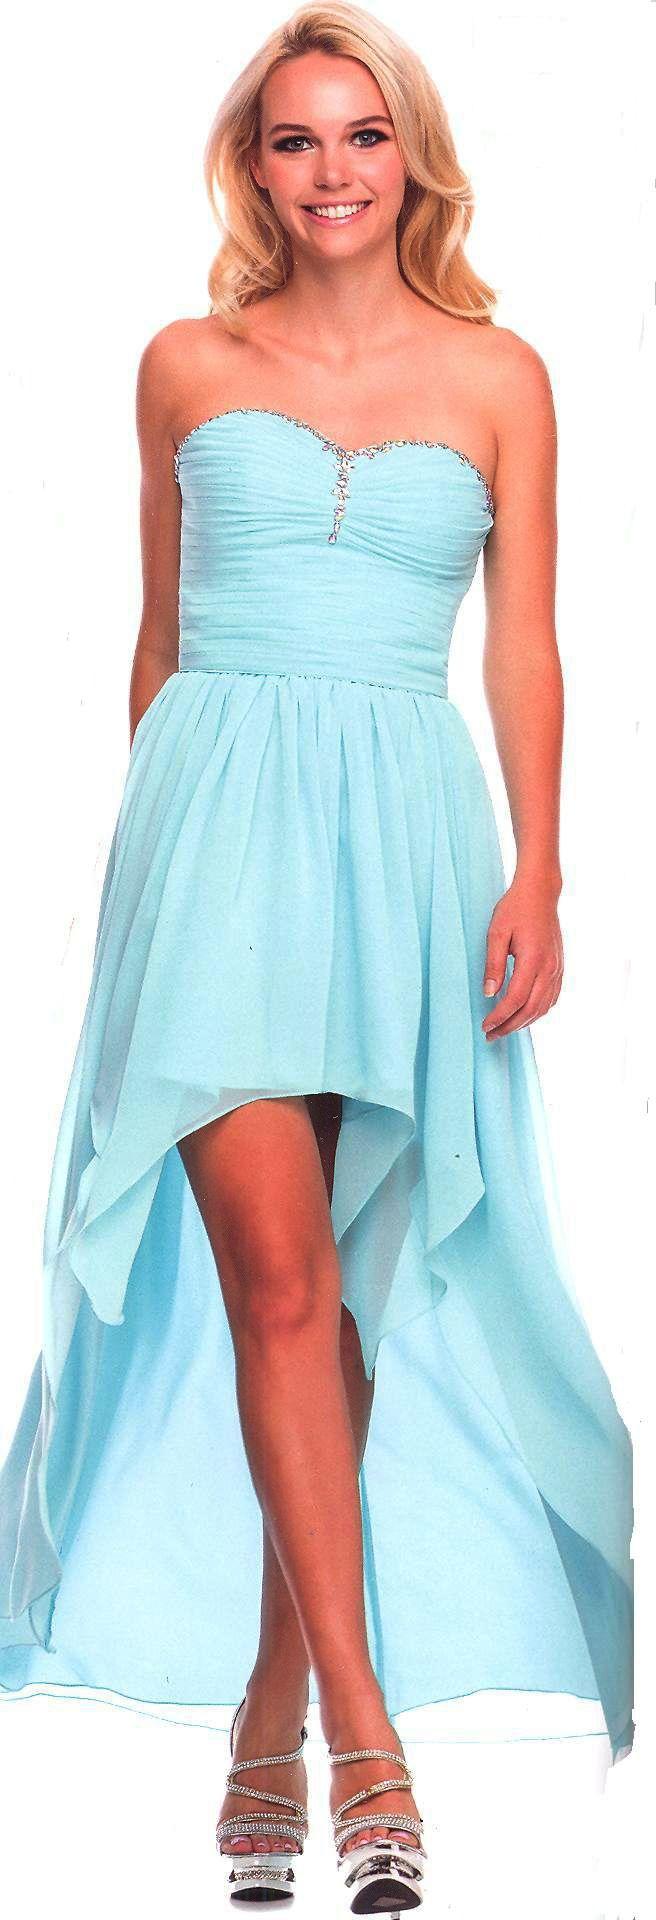 Best 25 bridesmaid dresses under 100 ideas on pinterest wedding homecoming dressesbrevening dressesbrbridesmaids dresses under 100br ombrellifo Gallery